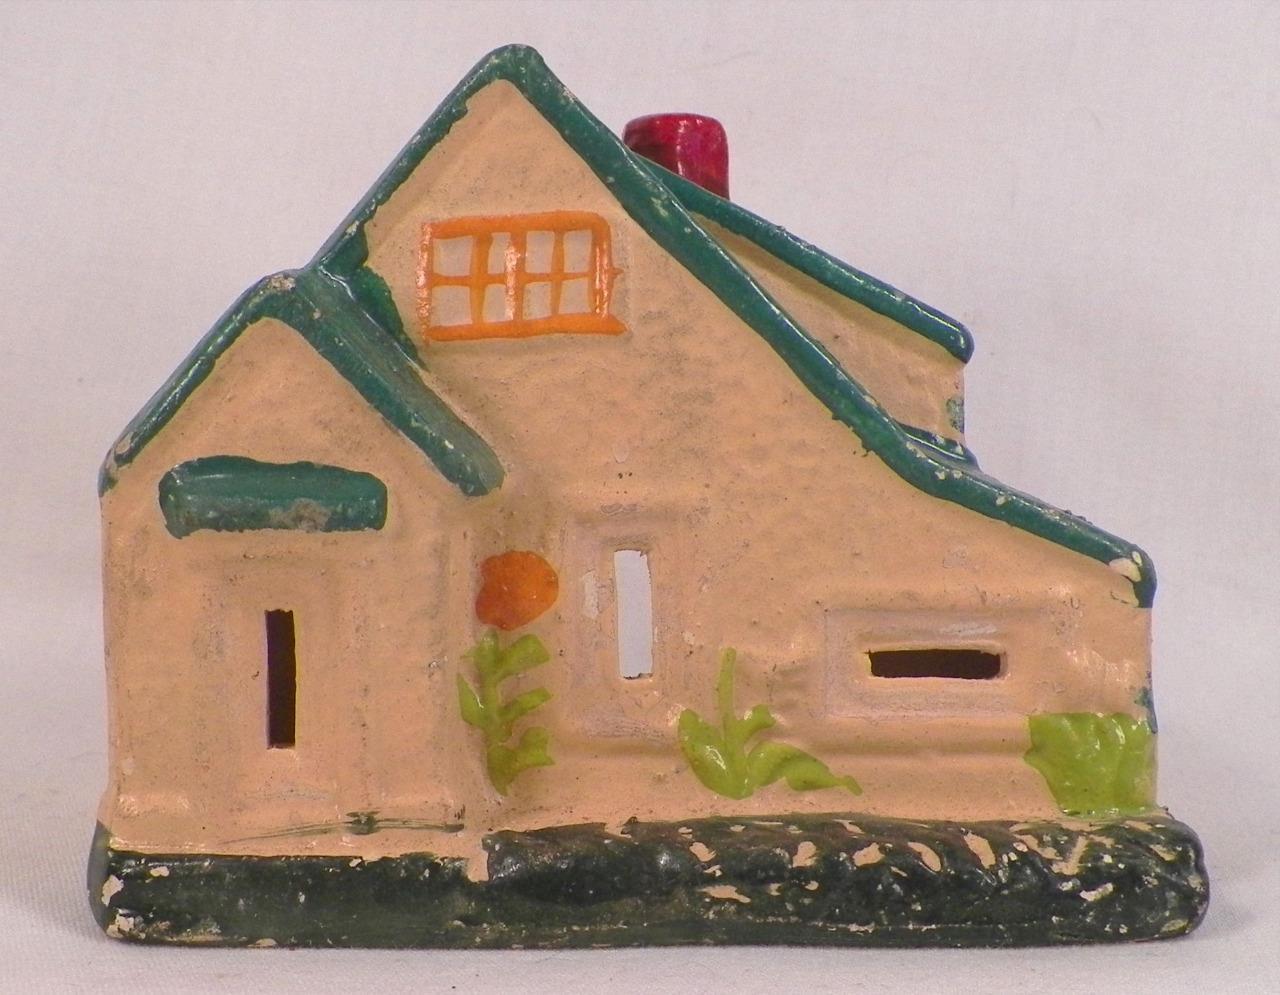 House Train Display Christmas Putz Compo Plaster Paris Tan HO Vintage Japan